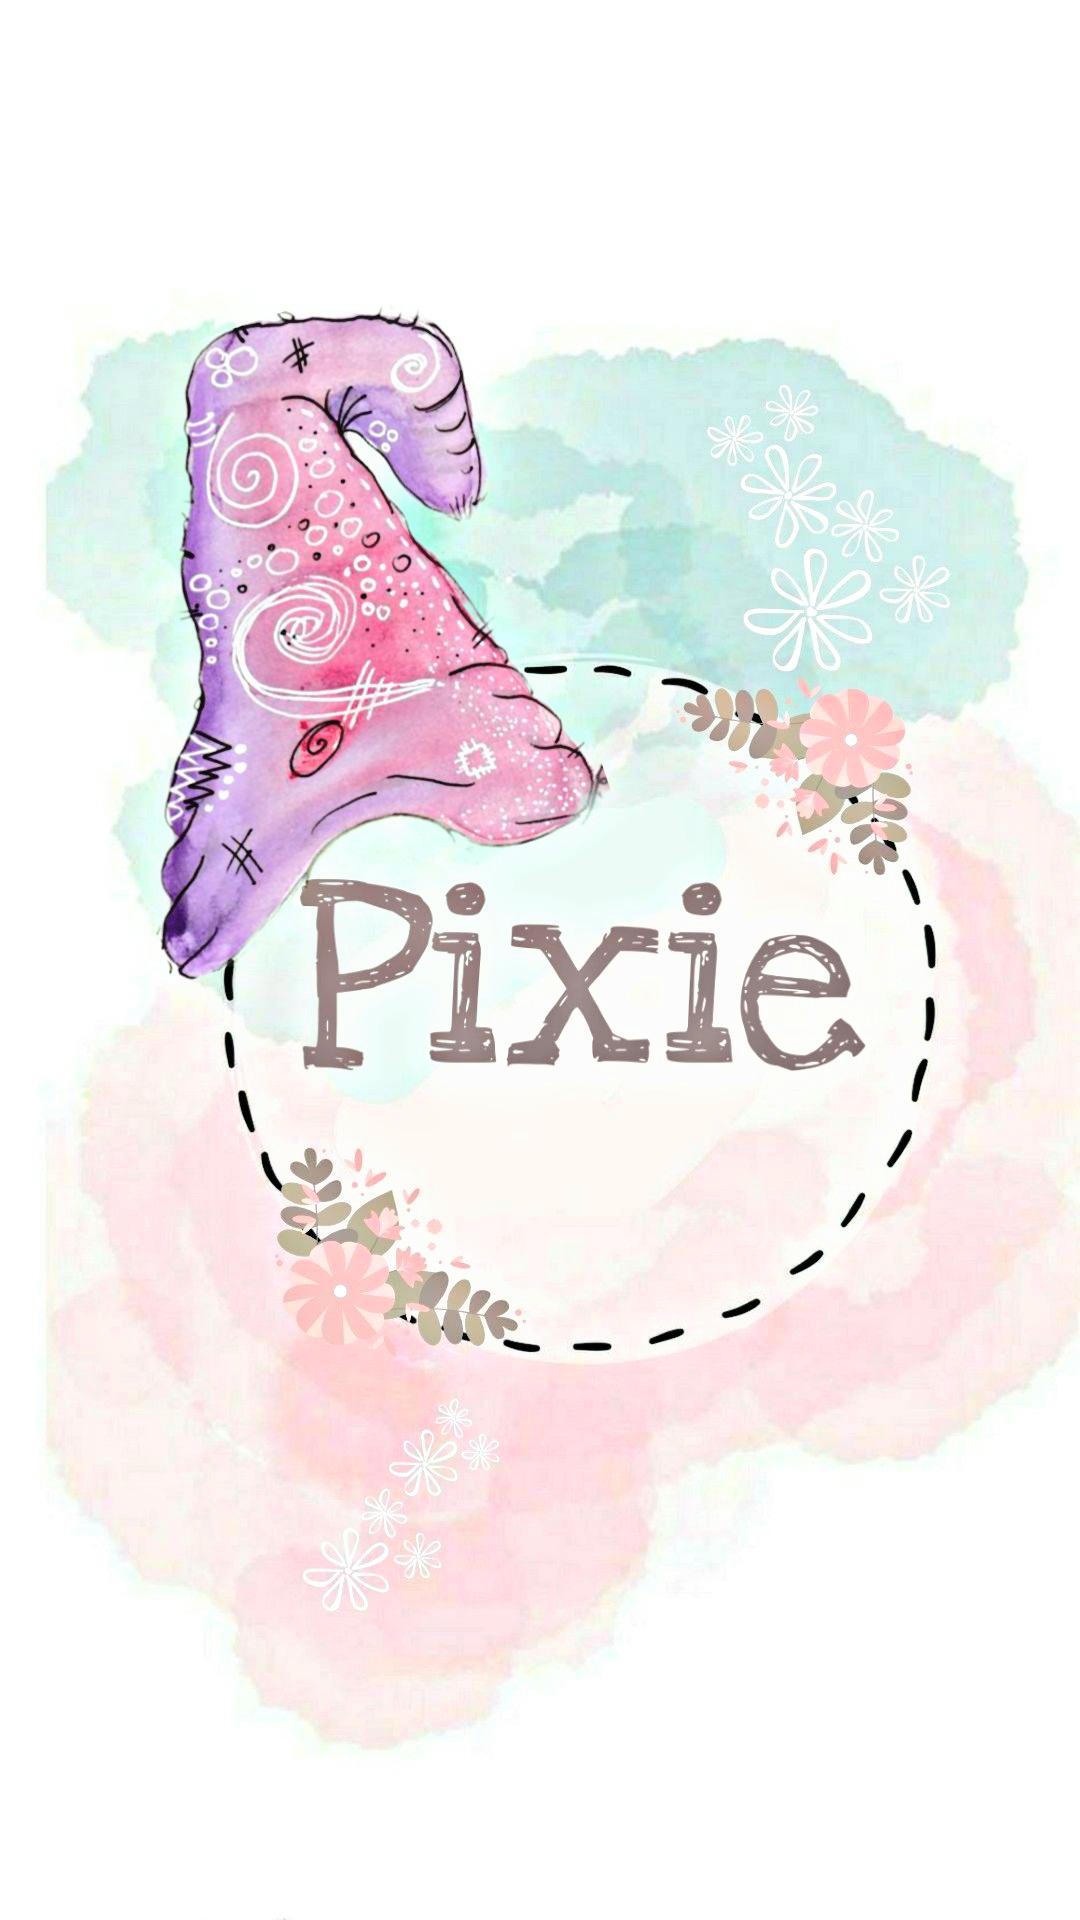 Pixie Italia